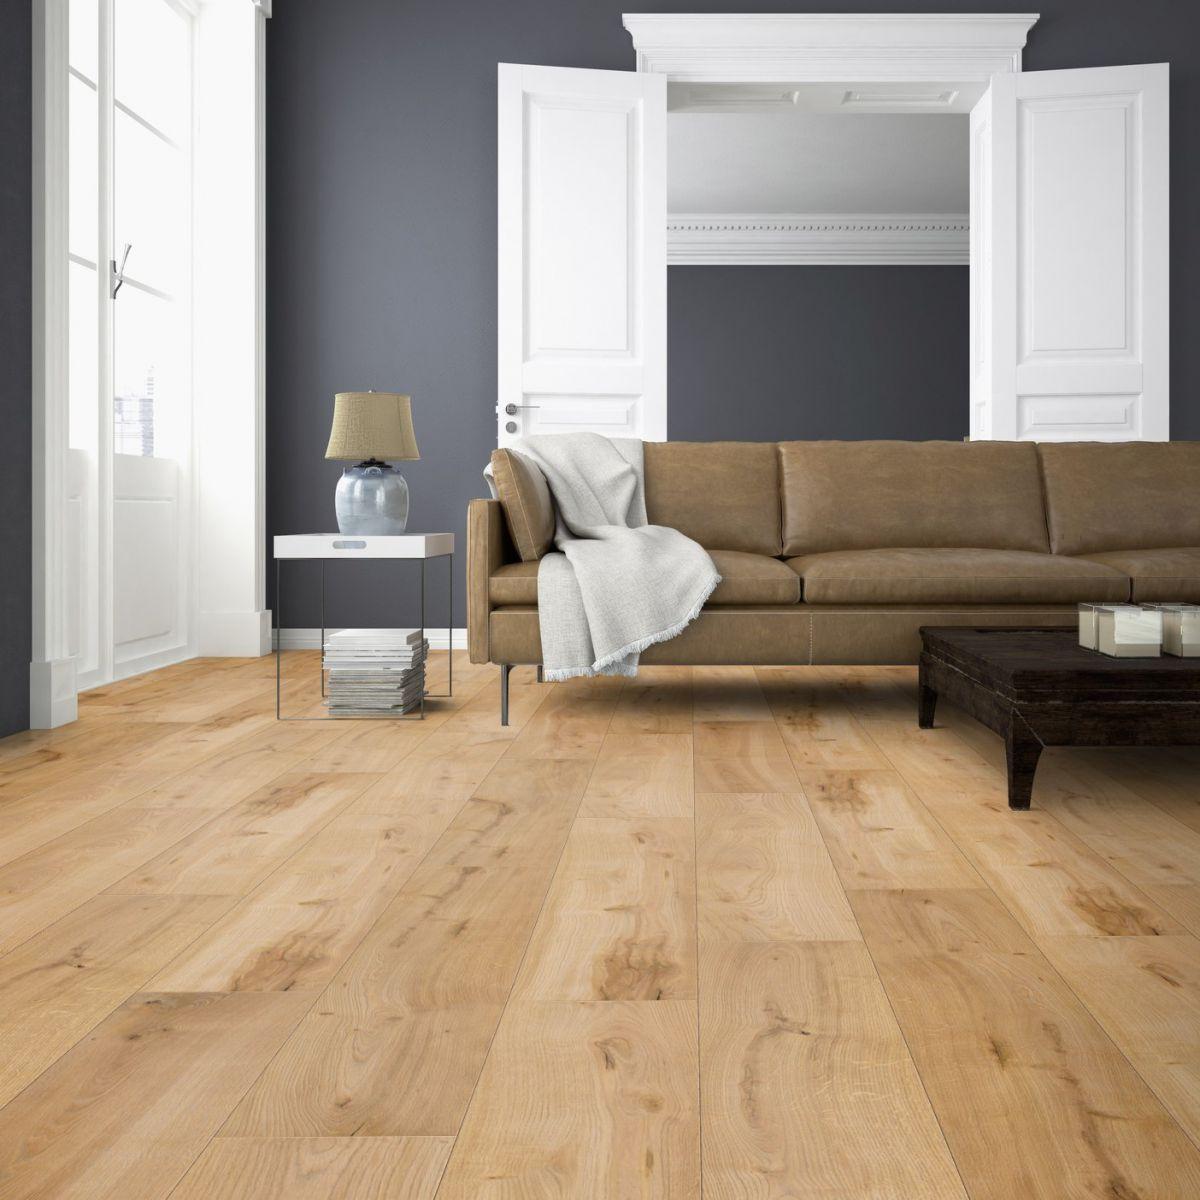 Avatara vloerdelen hout N02 interieur